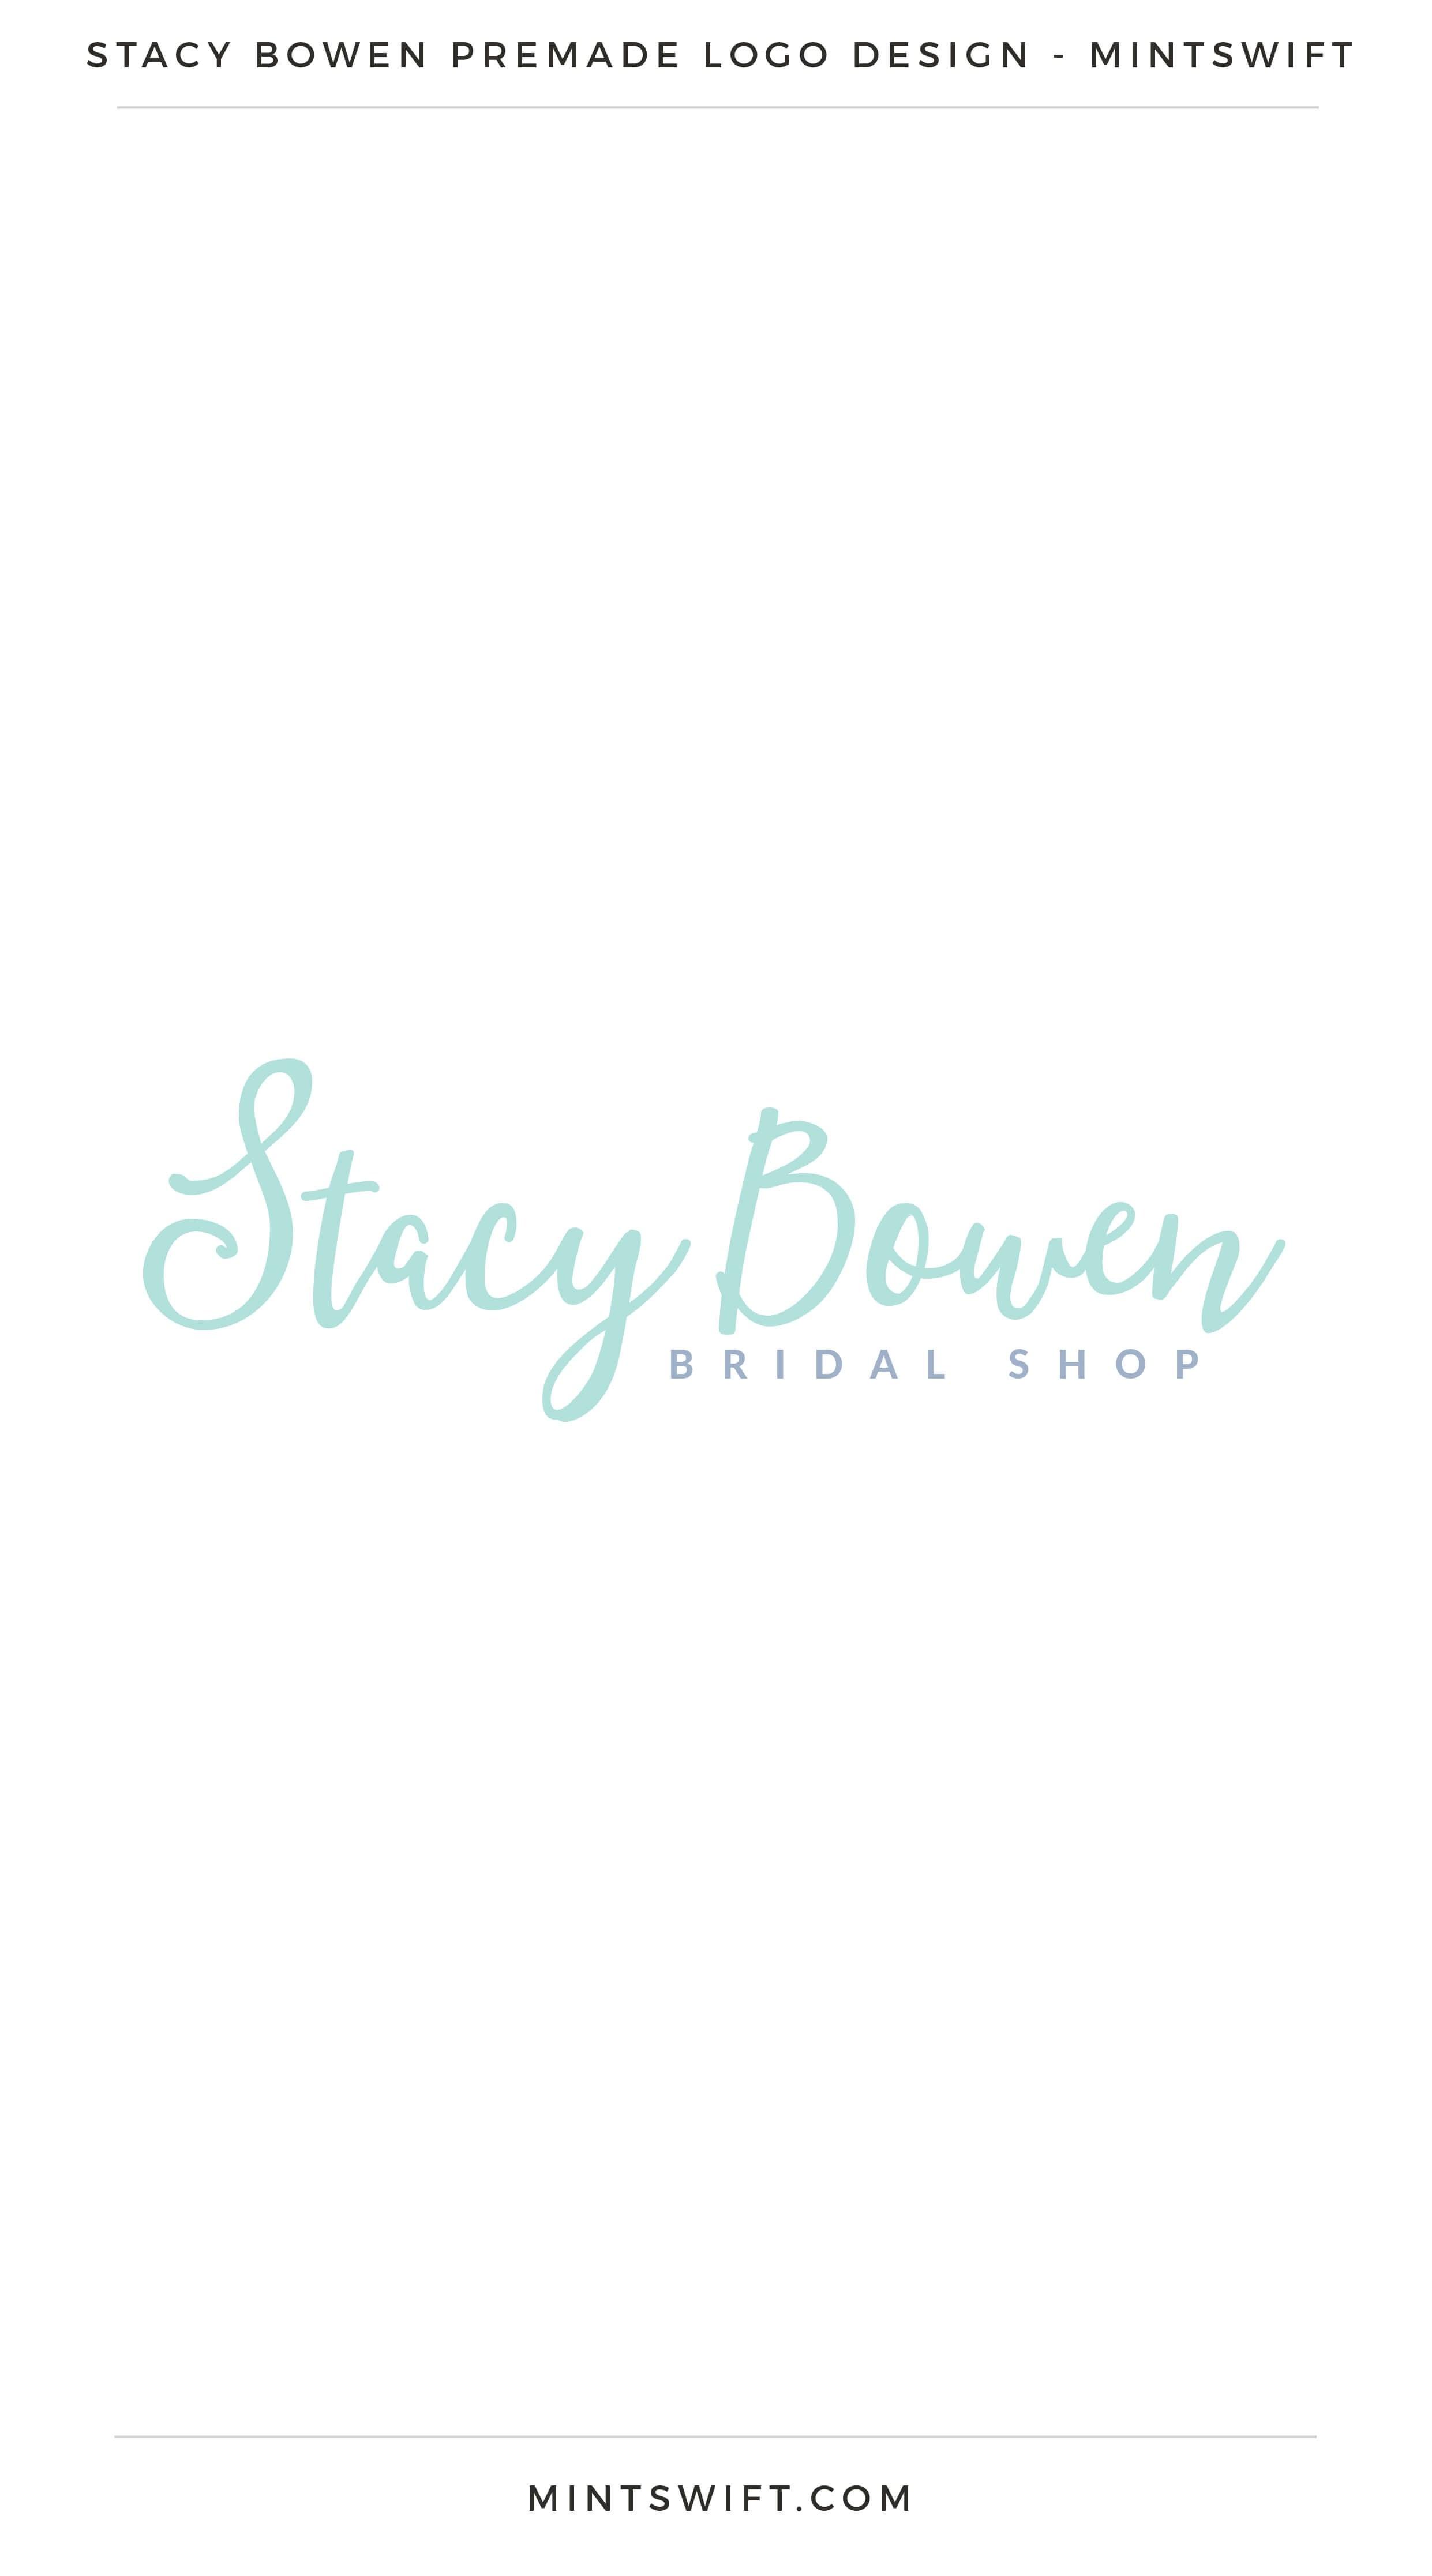 Stacy Bowen Premade Logo | Premade Logo | Premade logos | Pre-made logo | Premade Brand Design| Branding | Brand Design | Logo Shop | Branding kits shop | MintSwift Shop | Premade logo design | Add-On | Logo Design | MintSwift| Adrianna Glowacka | MintSwift Design